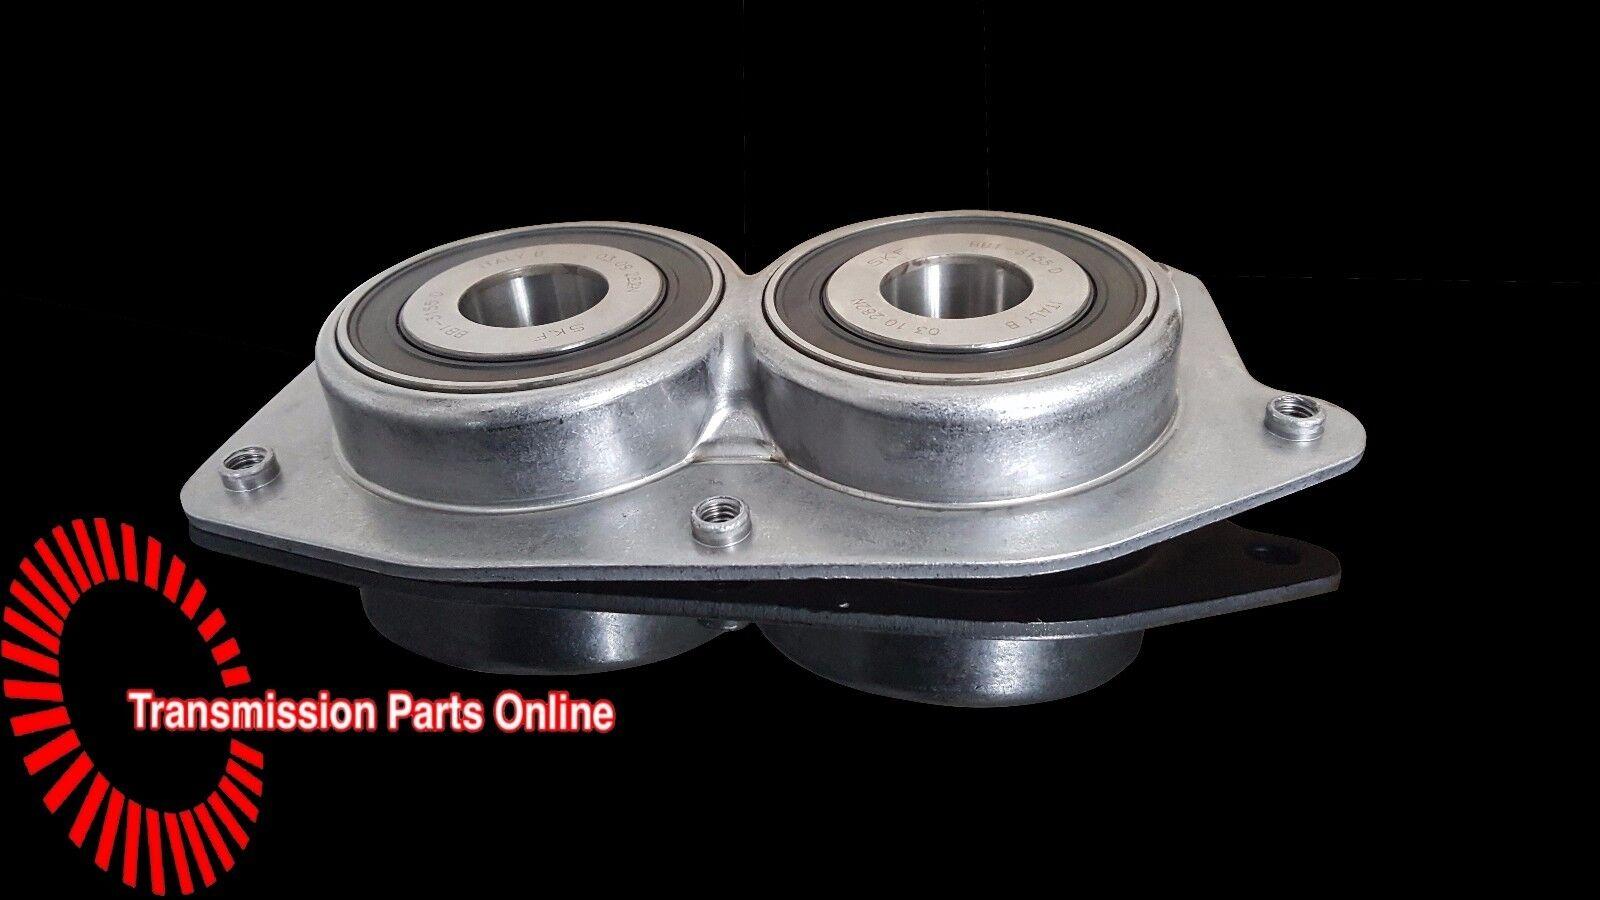 02T 5 Speed Gearbox Top Bearing Cartridge 02T311206H VW Polo 9N